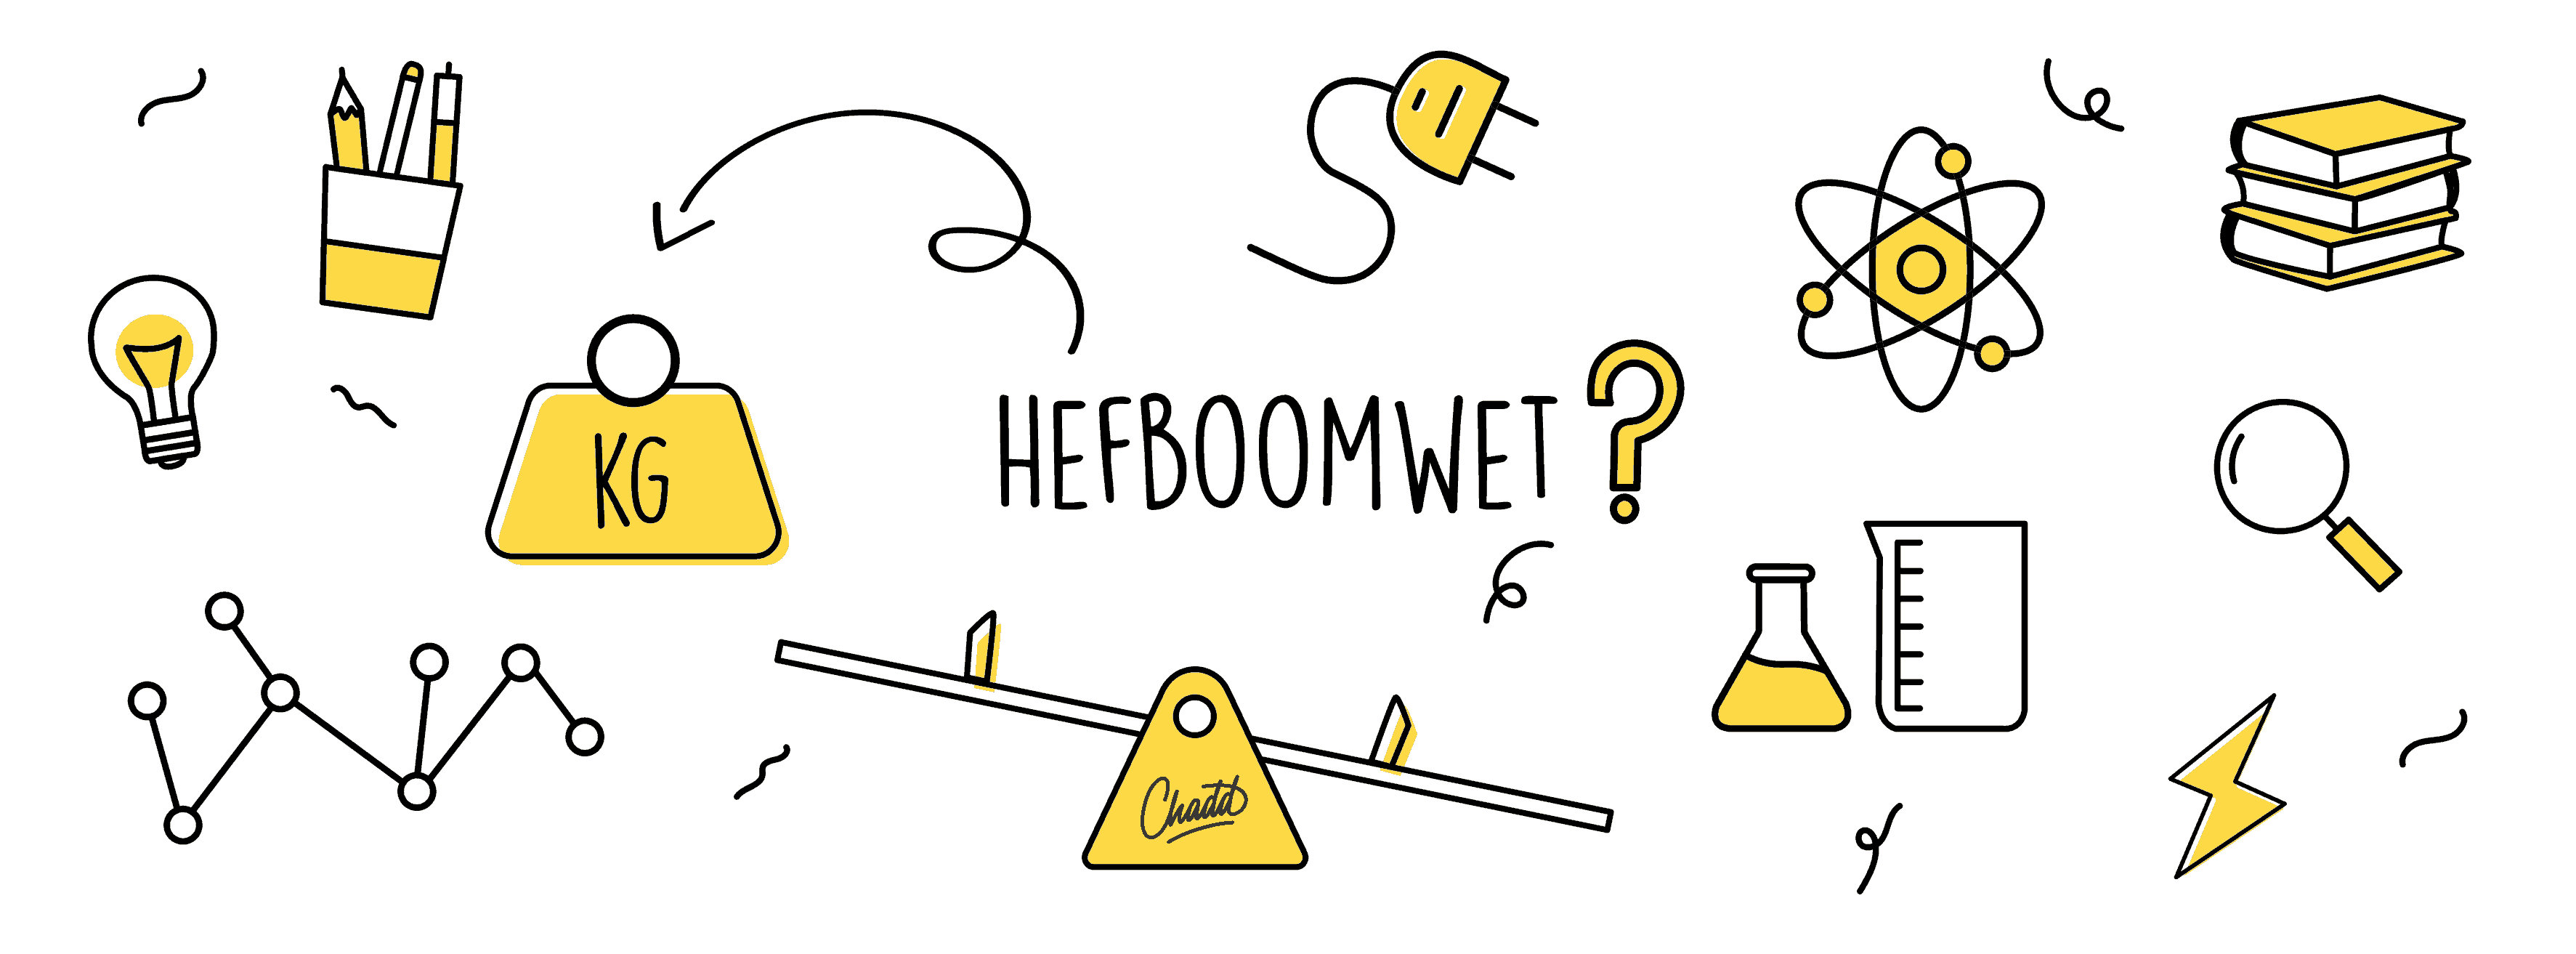 Hefboomwet